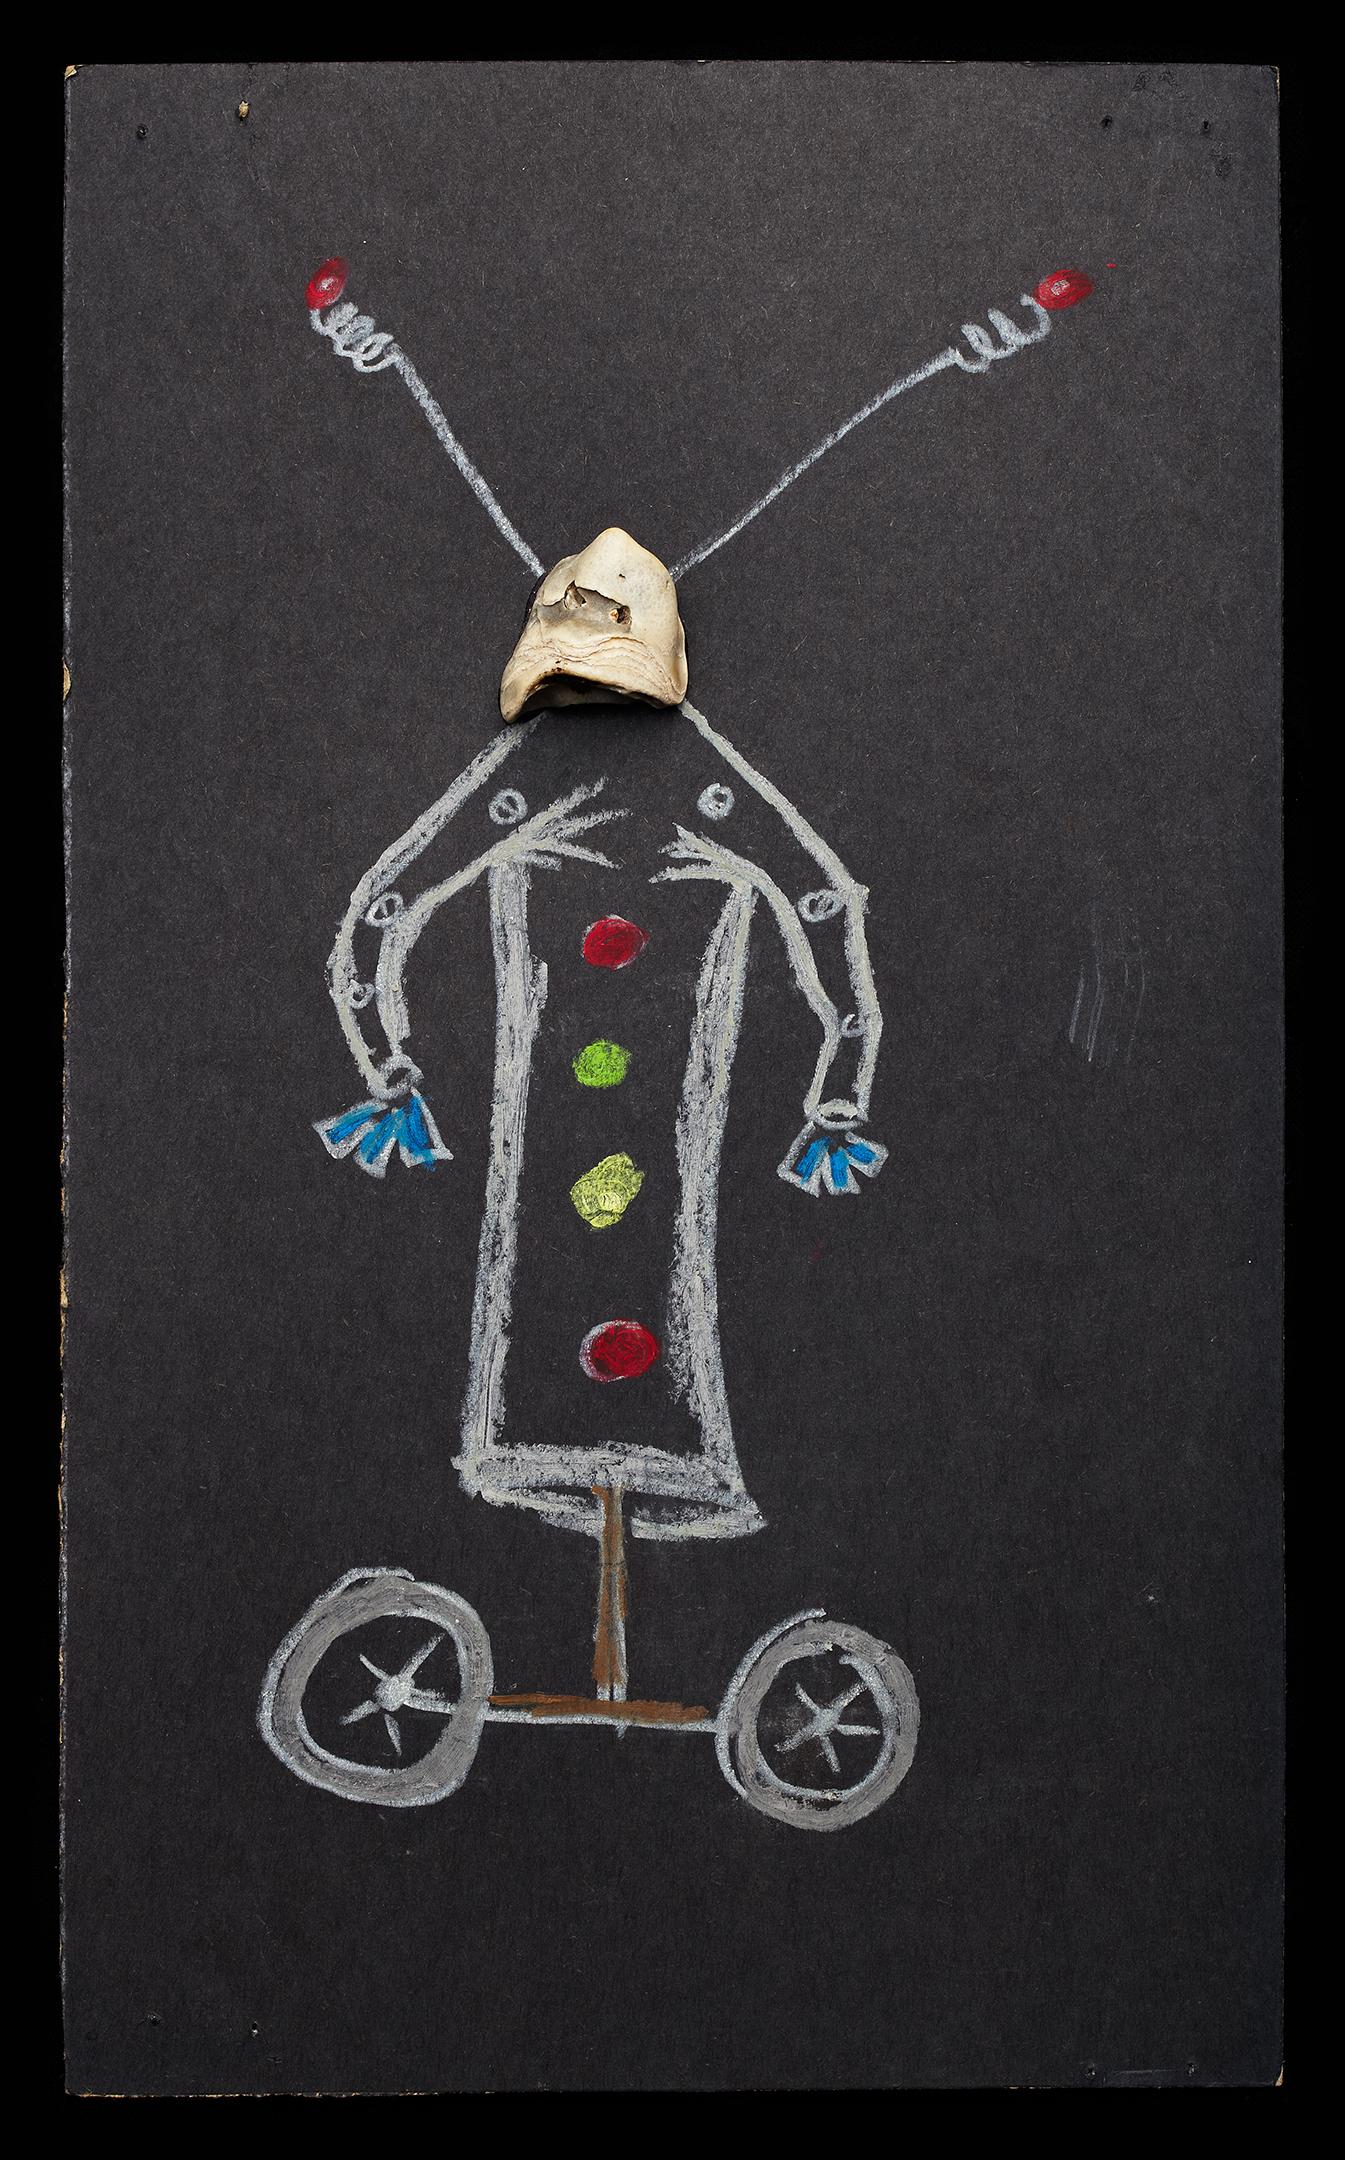 ShellArt-Robot by Thomas Wilson Laney